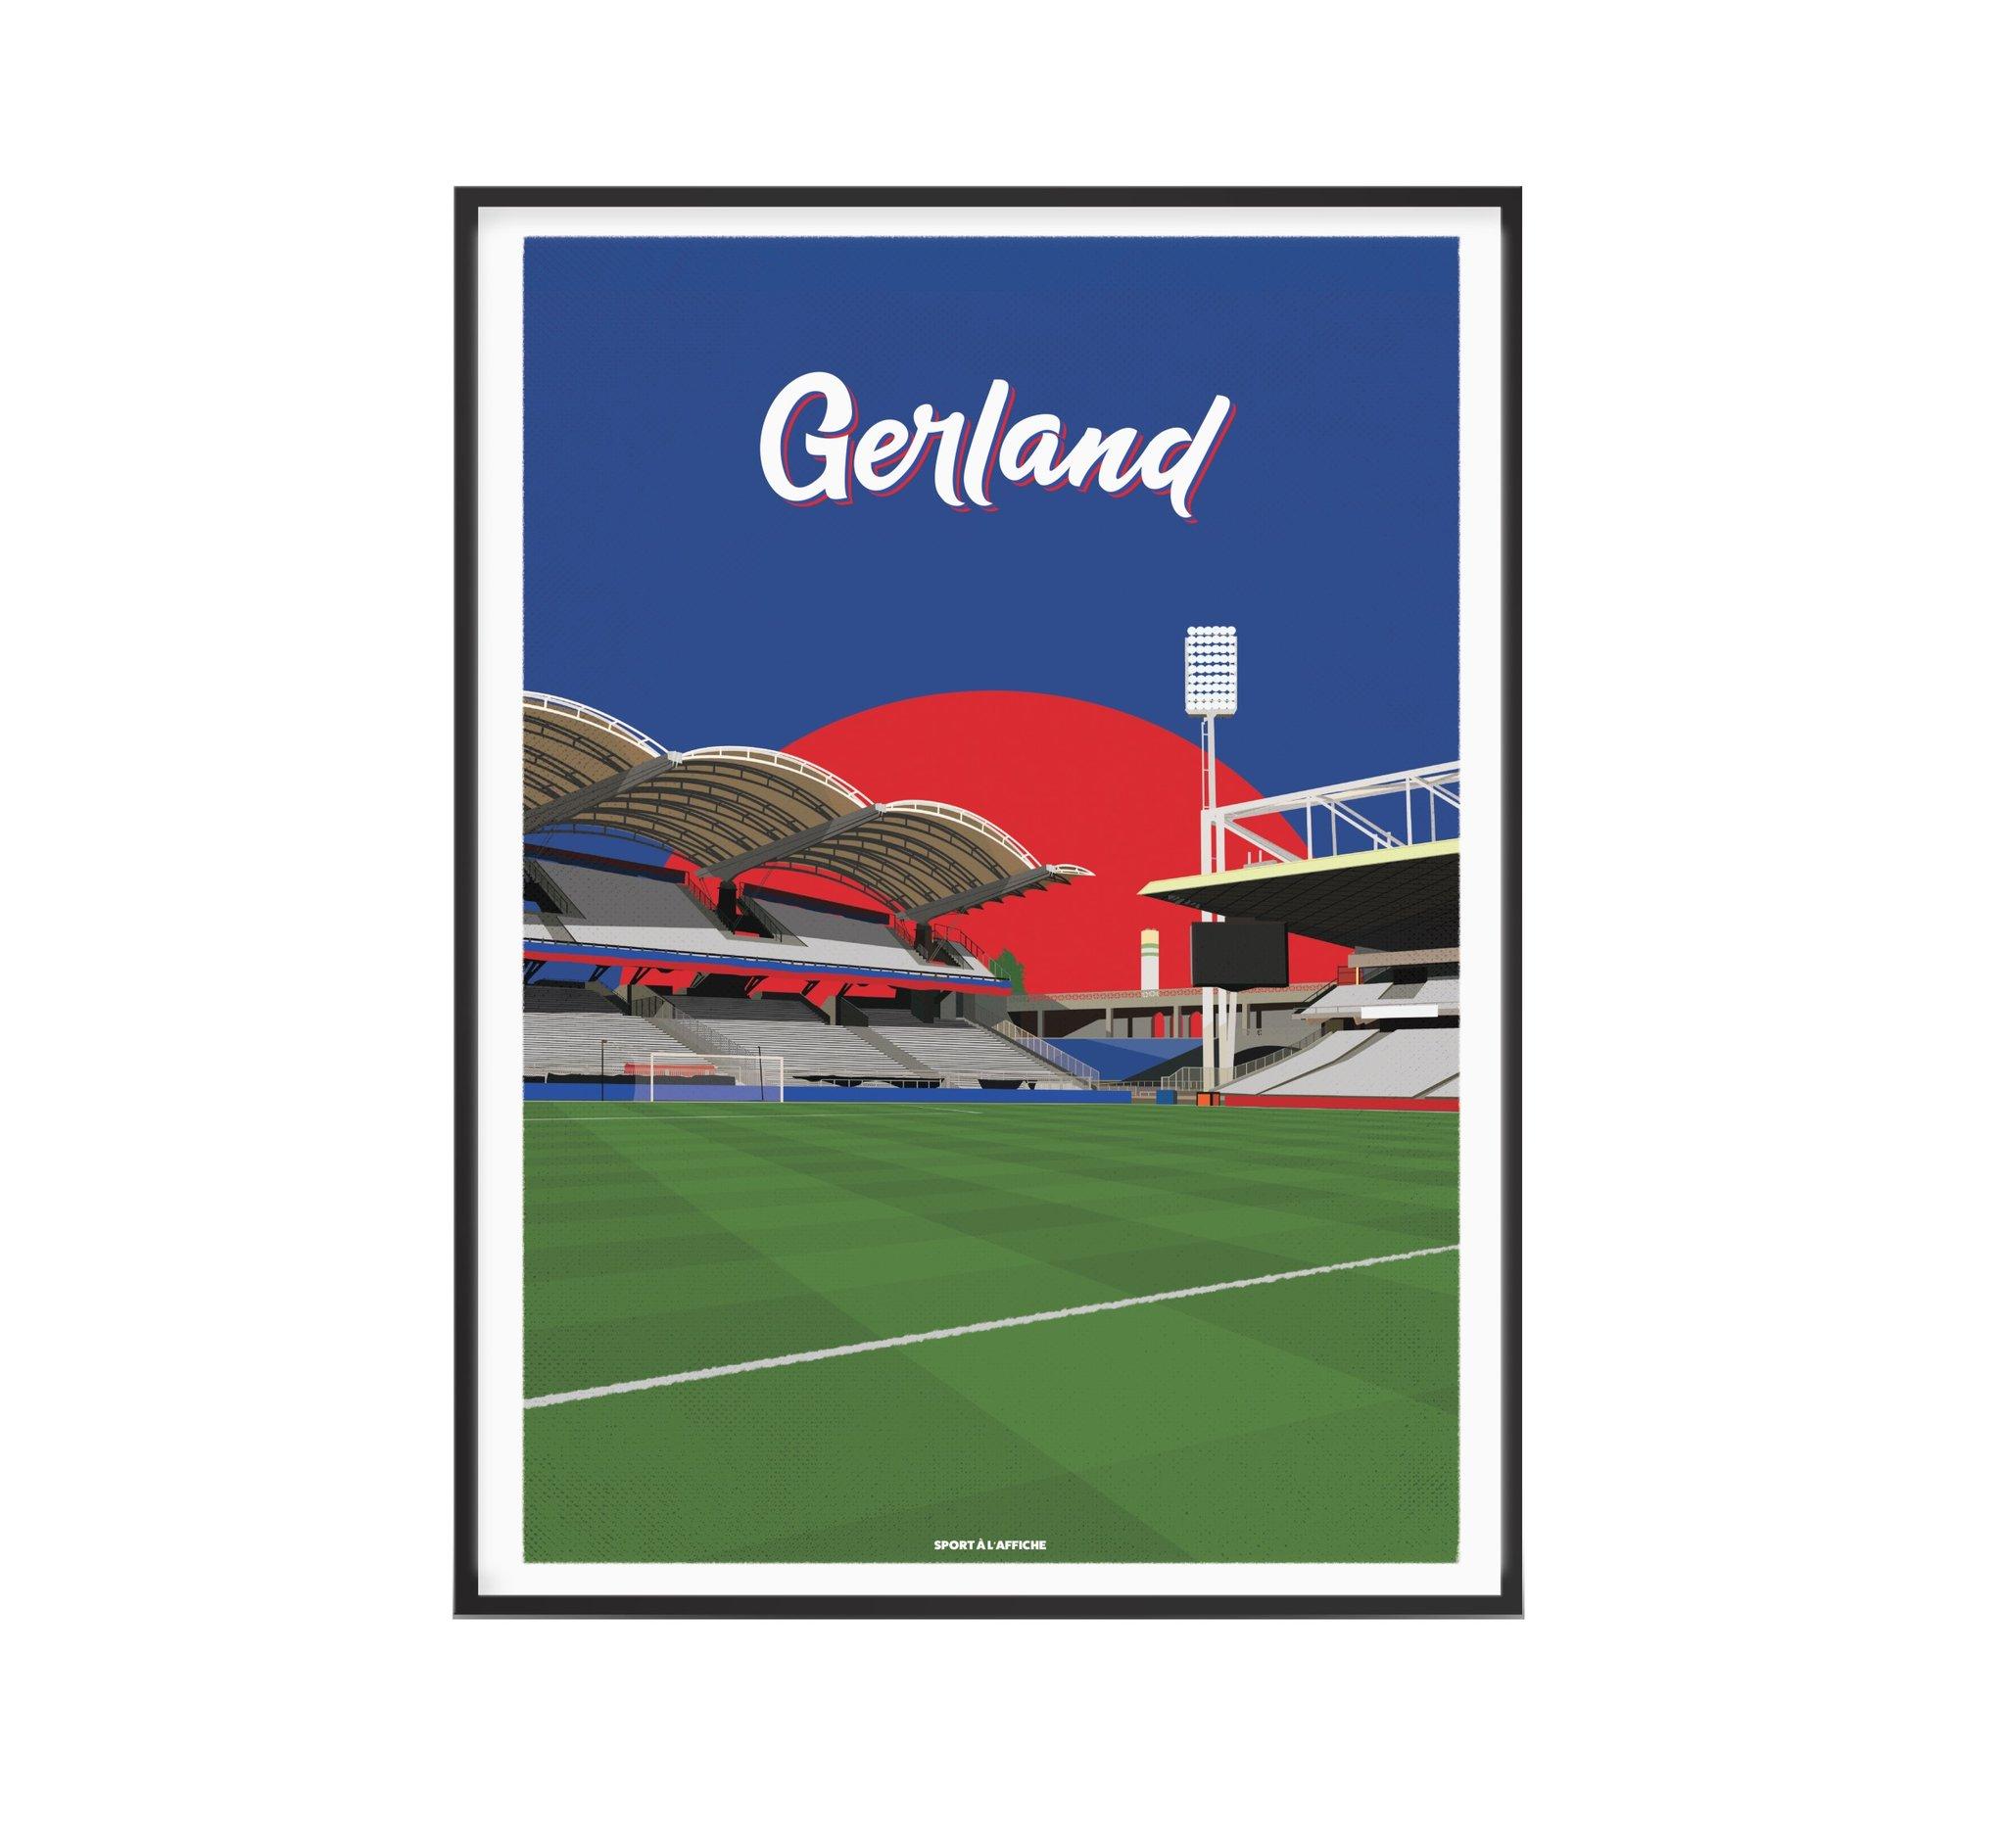 Affiche stade Gerland Lyon 30x40 cm